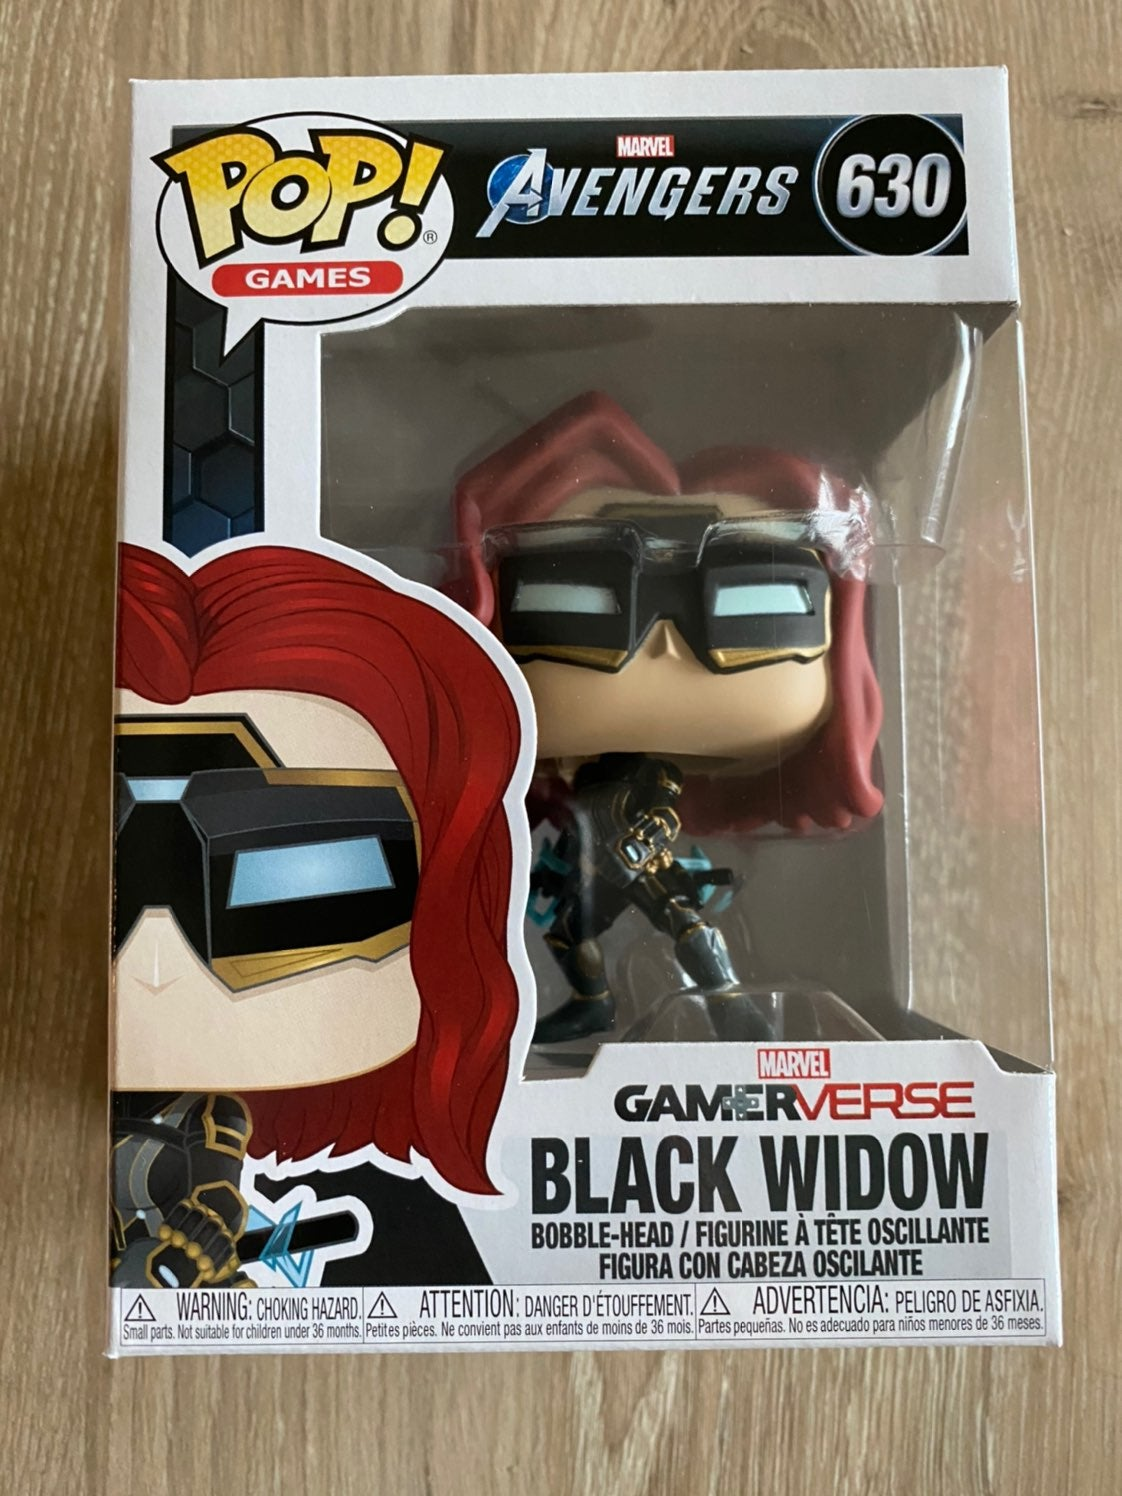 Funko Pop Avengers Gamerverse Black Wido